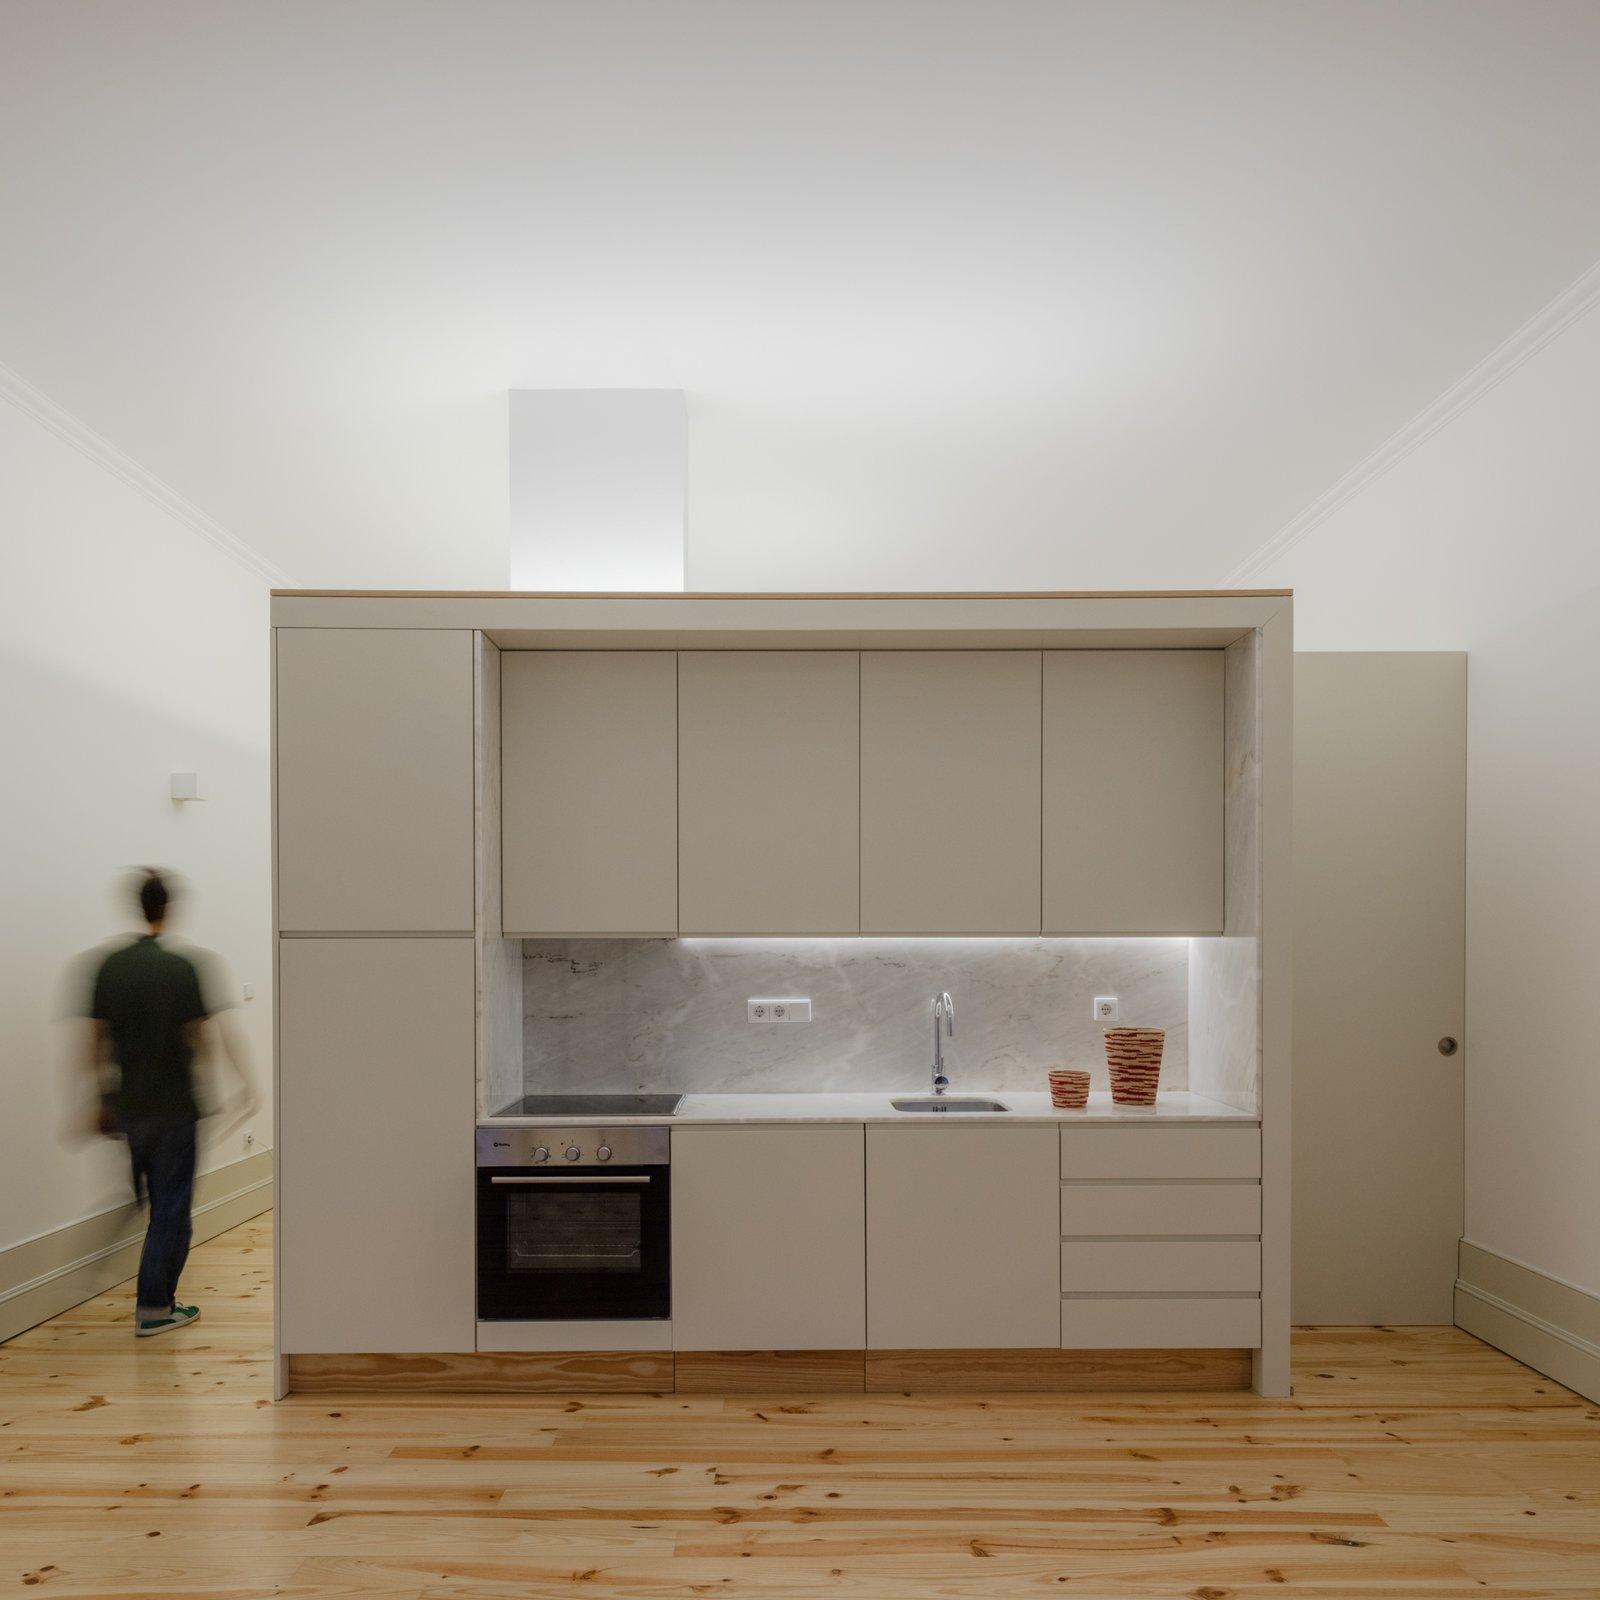 Tagged: Kitchen, Light Hardwood Floor, White Cabinet, Marble Counter, and Marble Backsplashe.  Rua da Boavista by Leibal